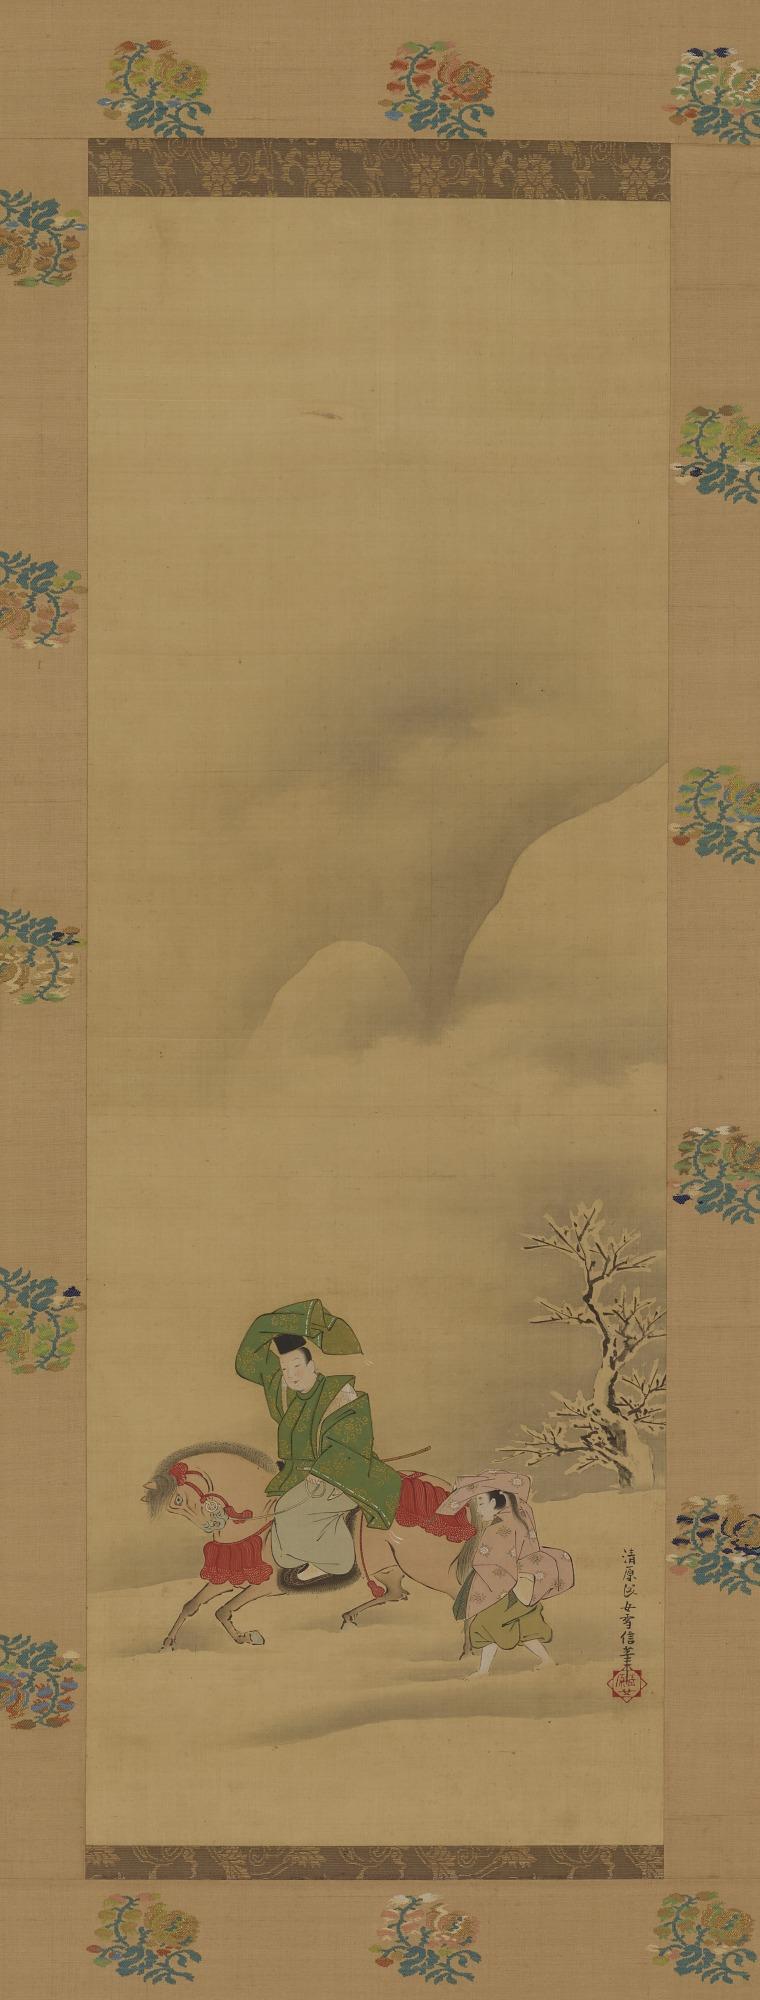 detail: Lord on horseback (Crossing at Sano)